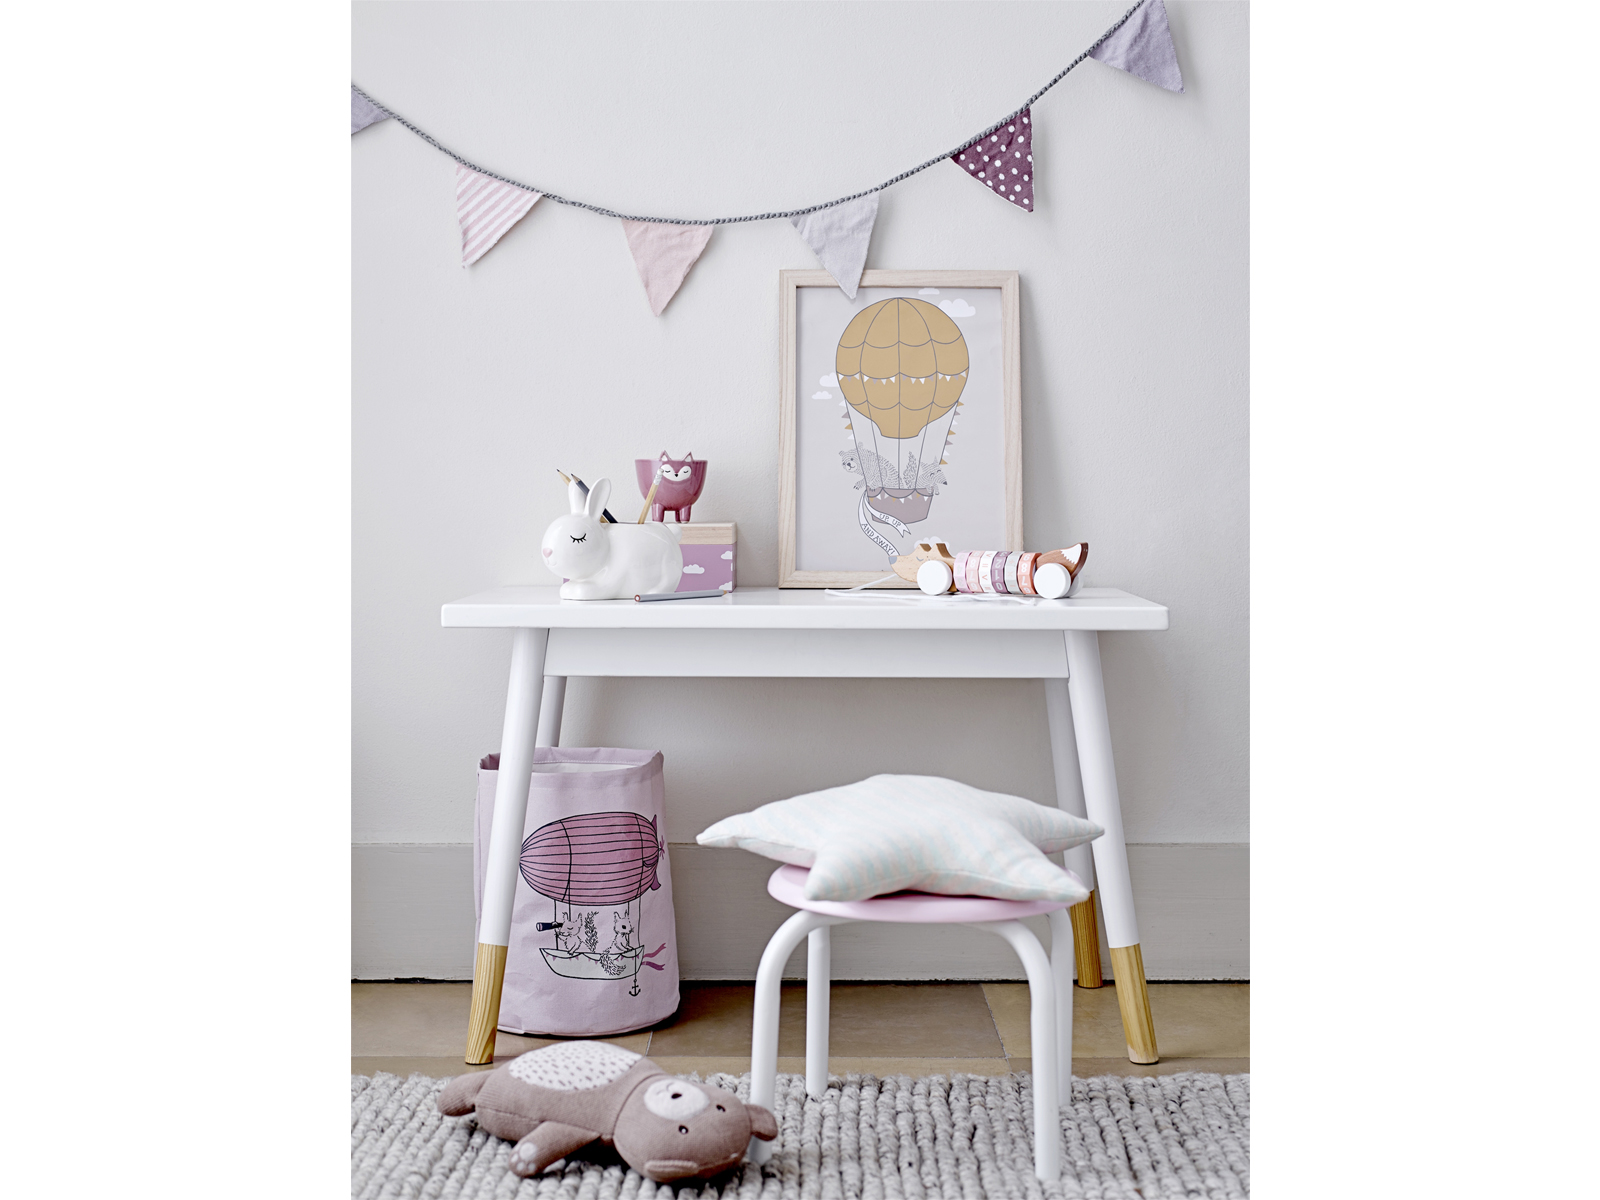 bloomingville kinderposter 40 x 30 cm fallschirm mit hase grau. Black Bedroom Furniture Sets. Home Design Ideas